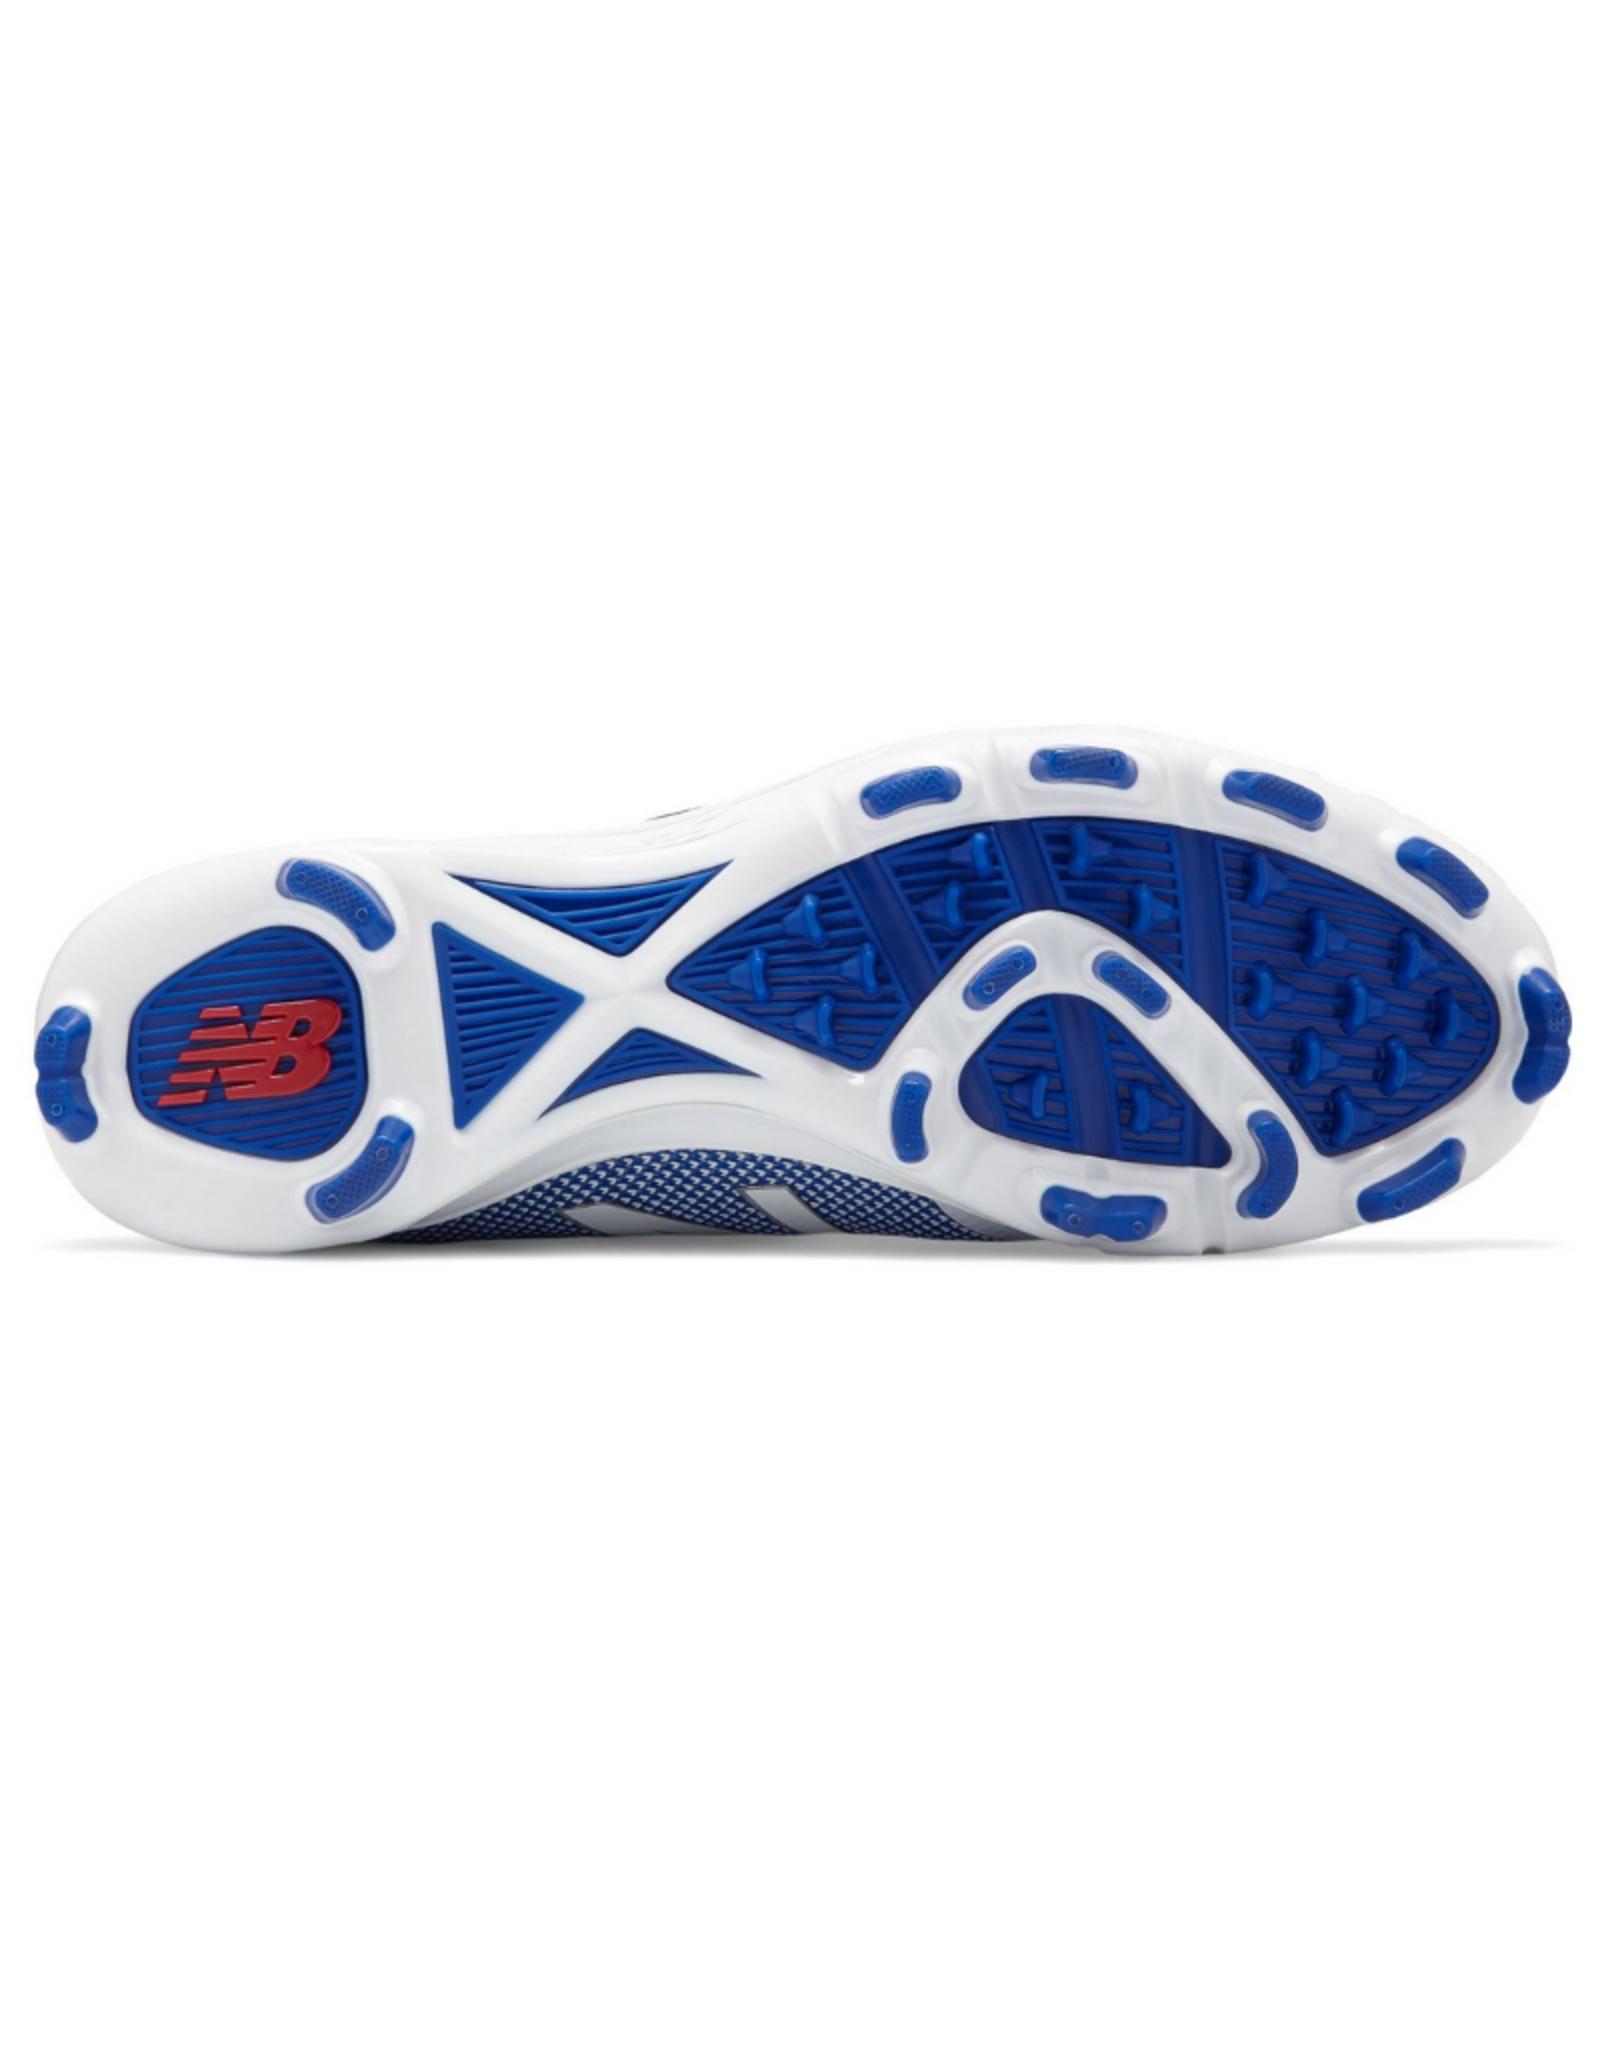 New Balance Men's Mid Softball Cleat Blue